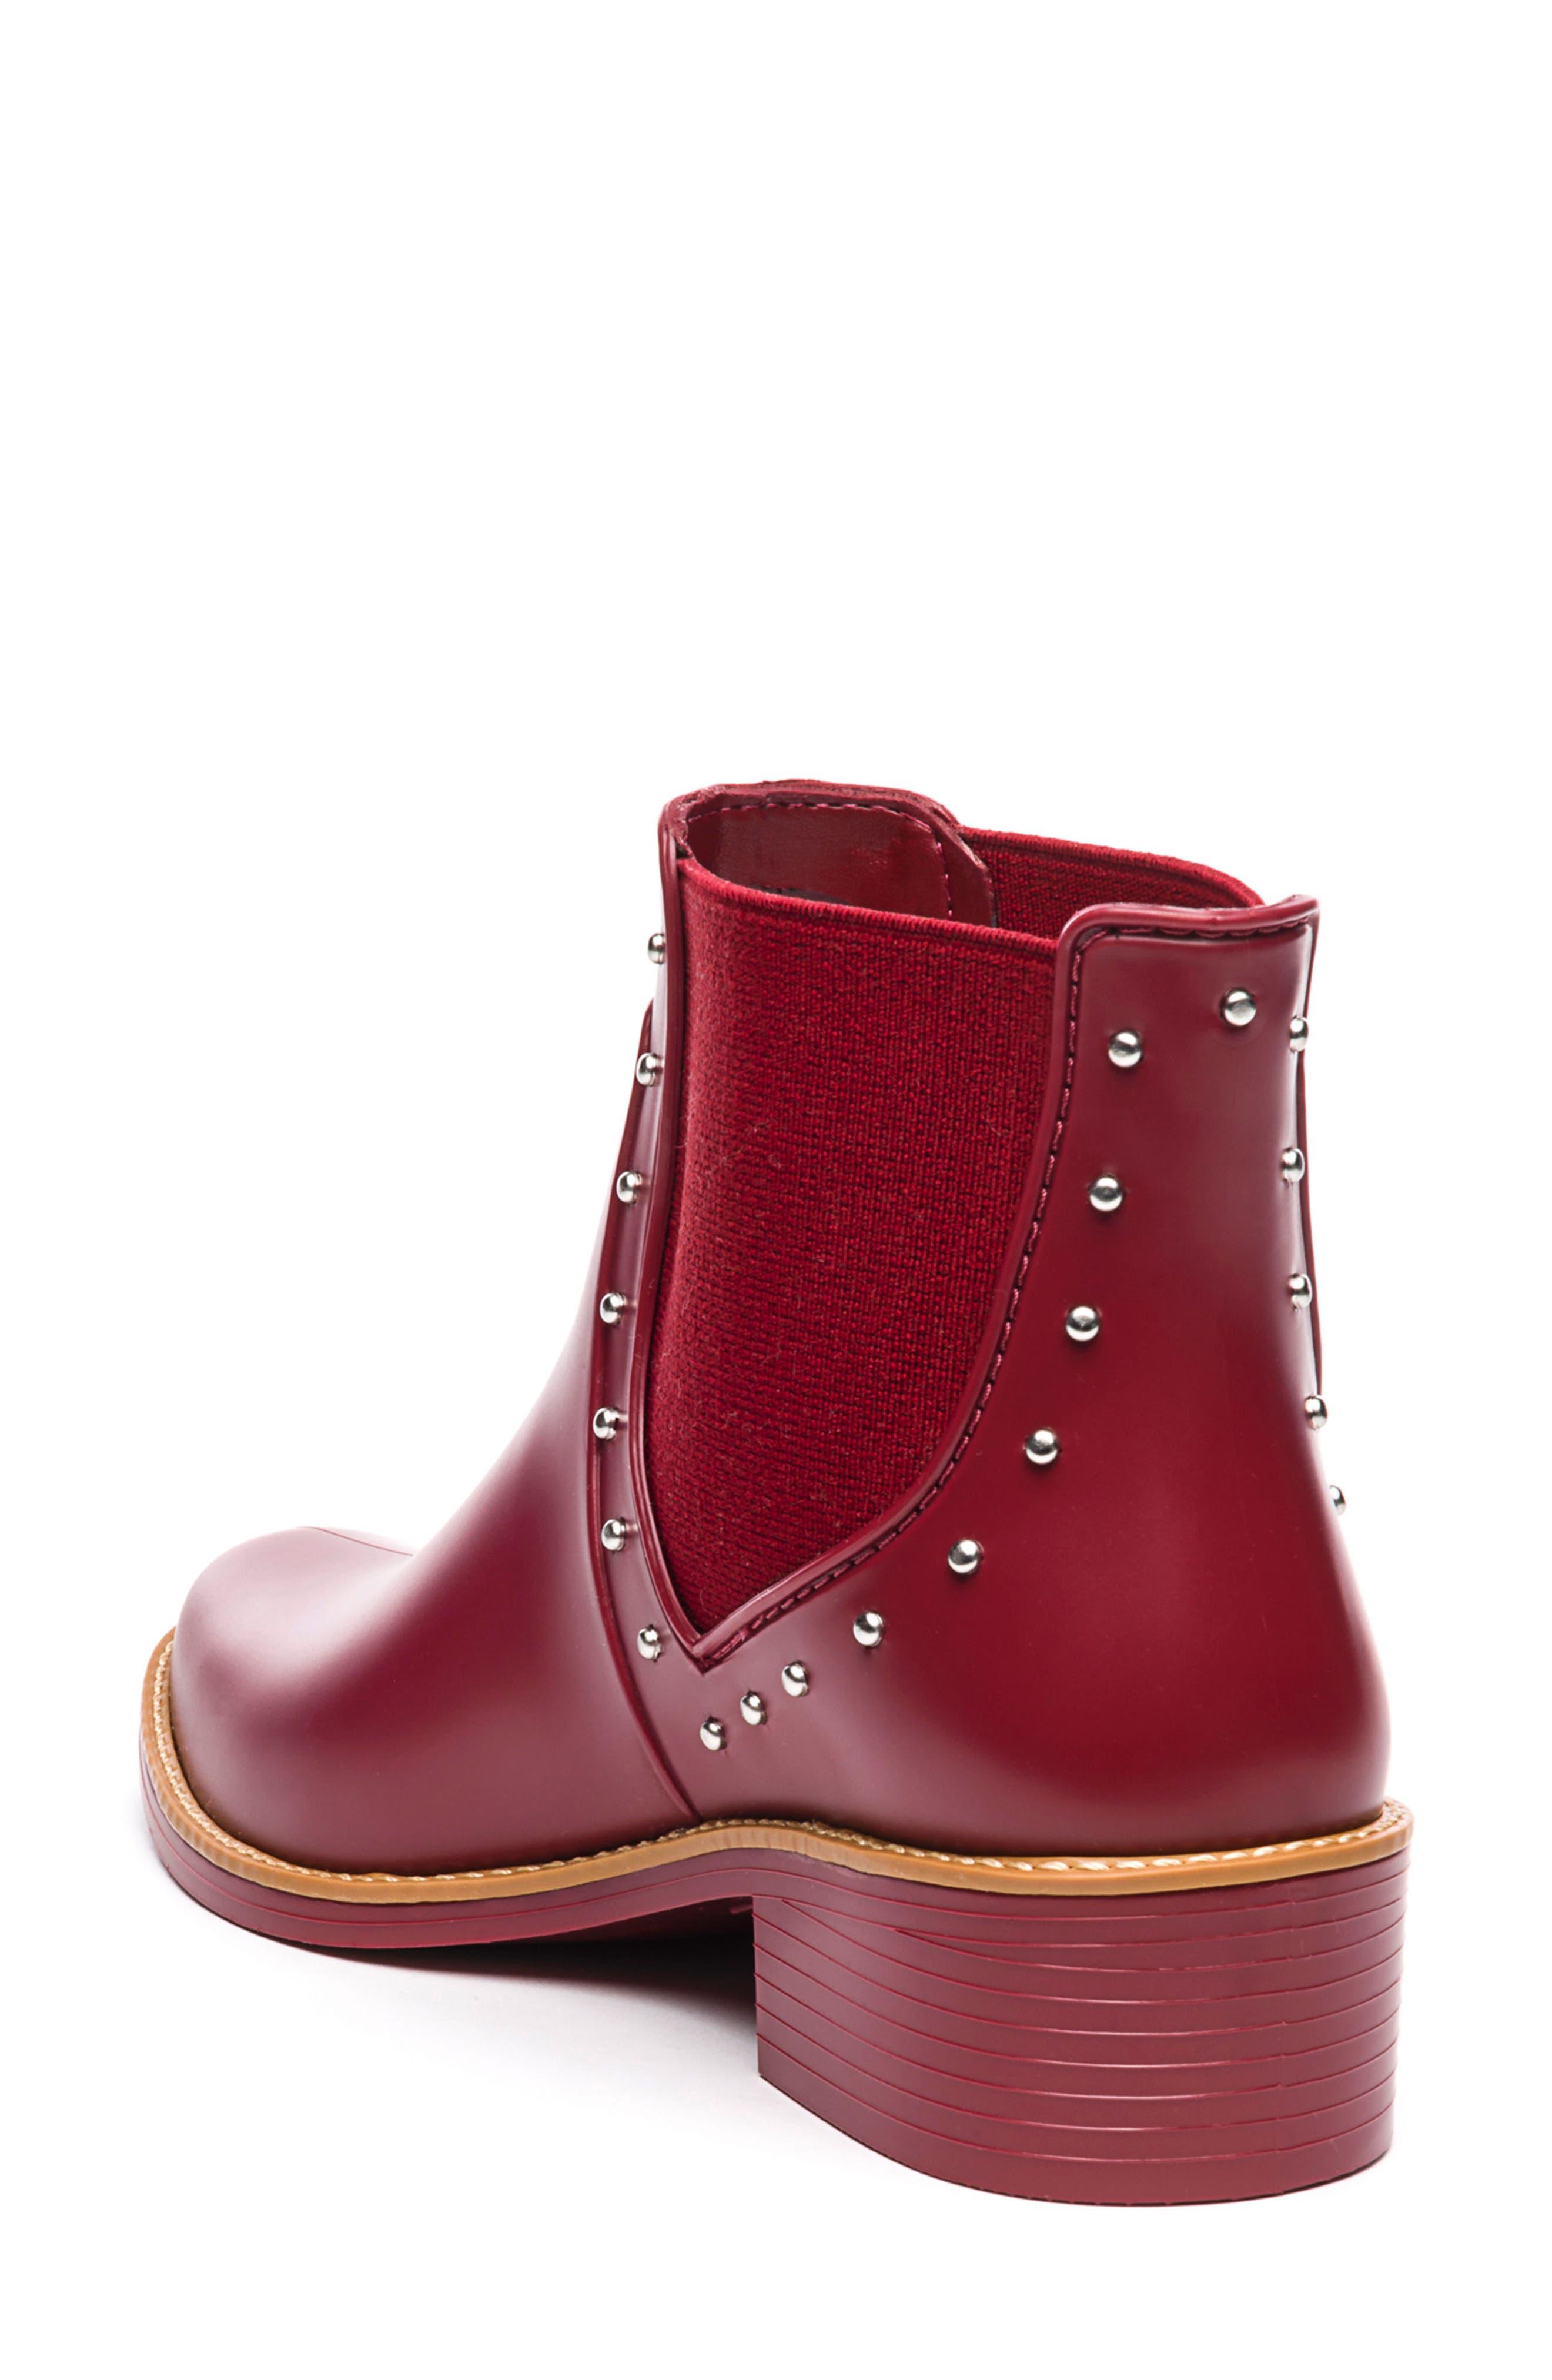 86db61115e61 Women s Metallic Rain Boots